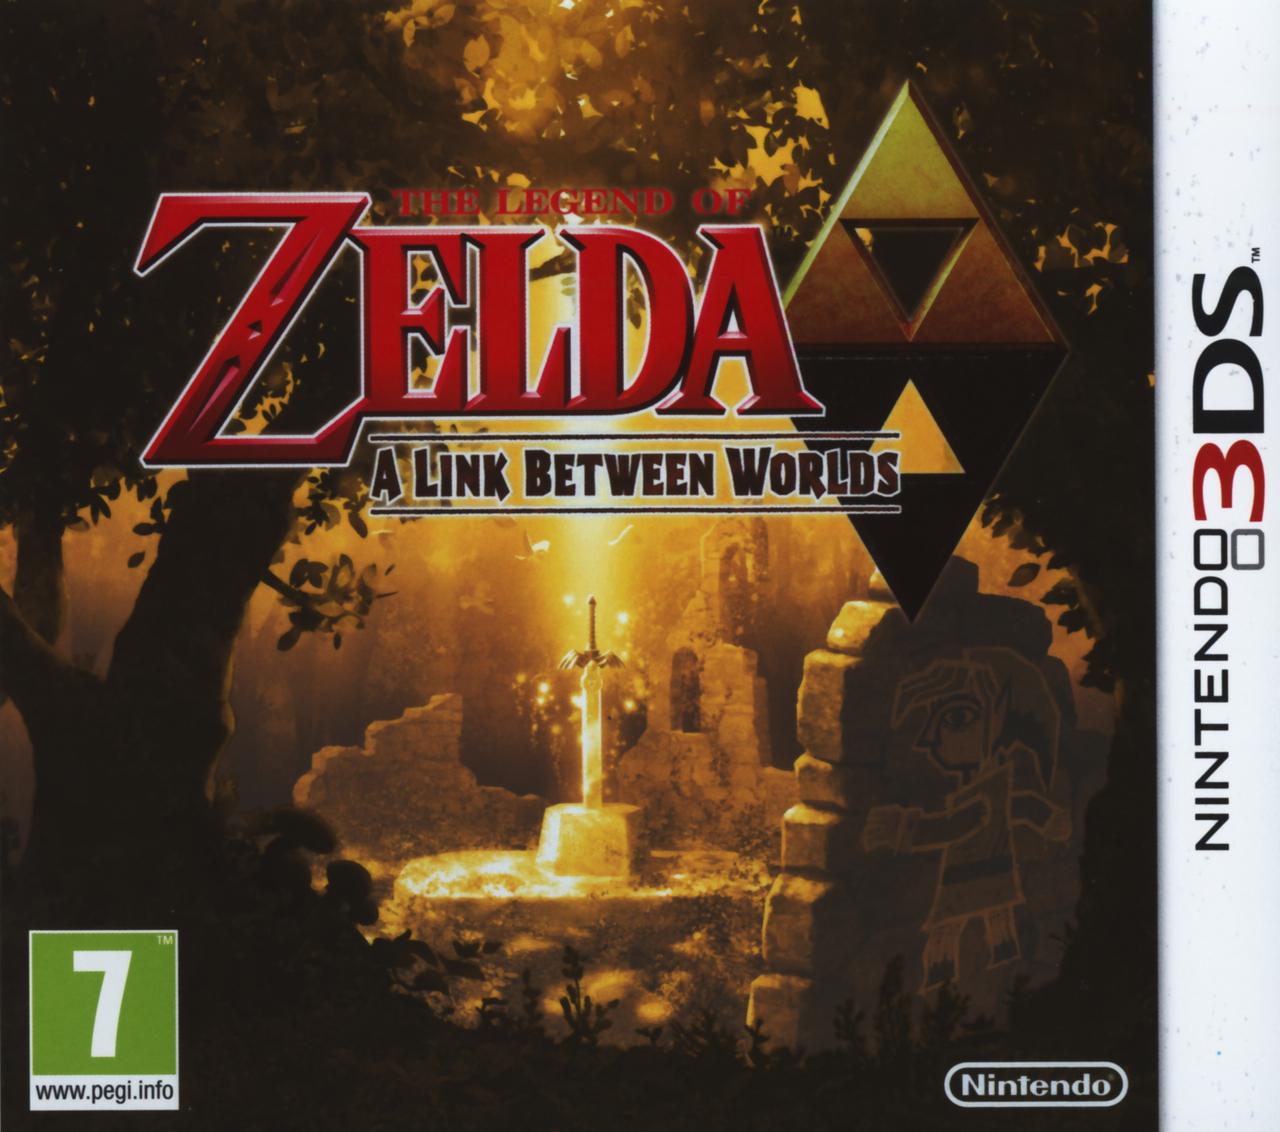 A link between world (3DS)